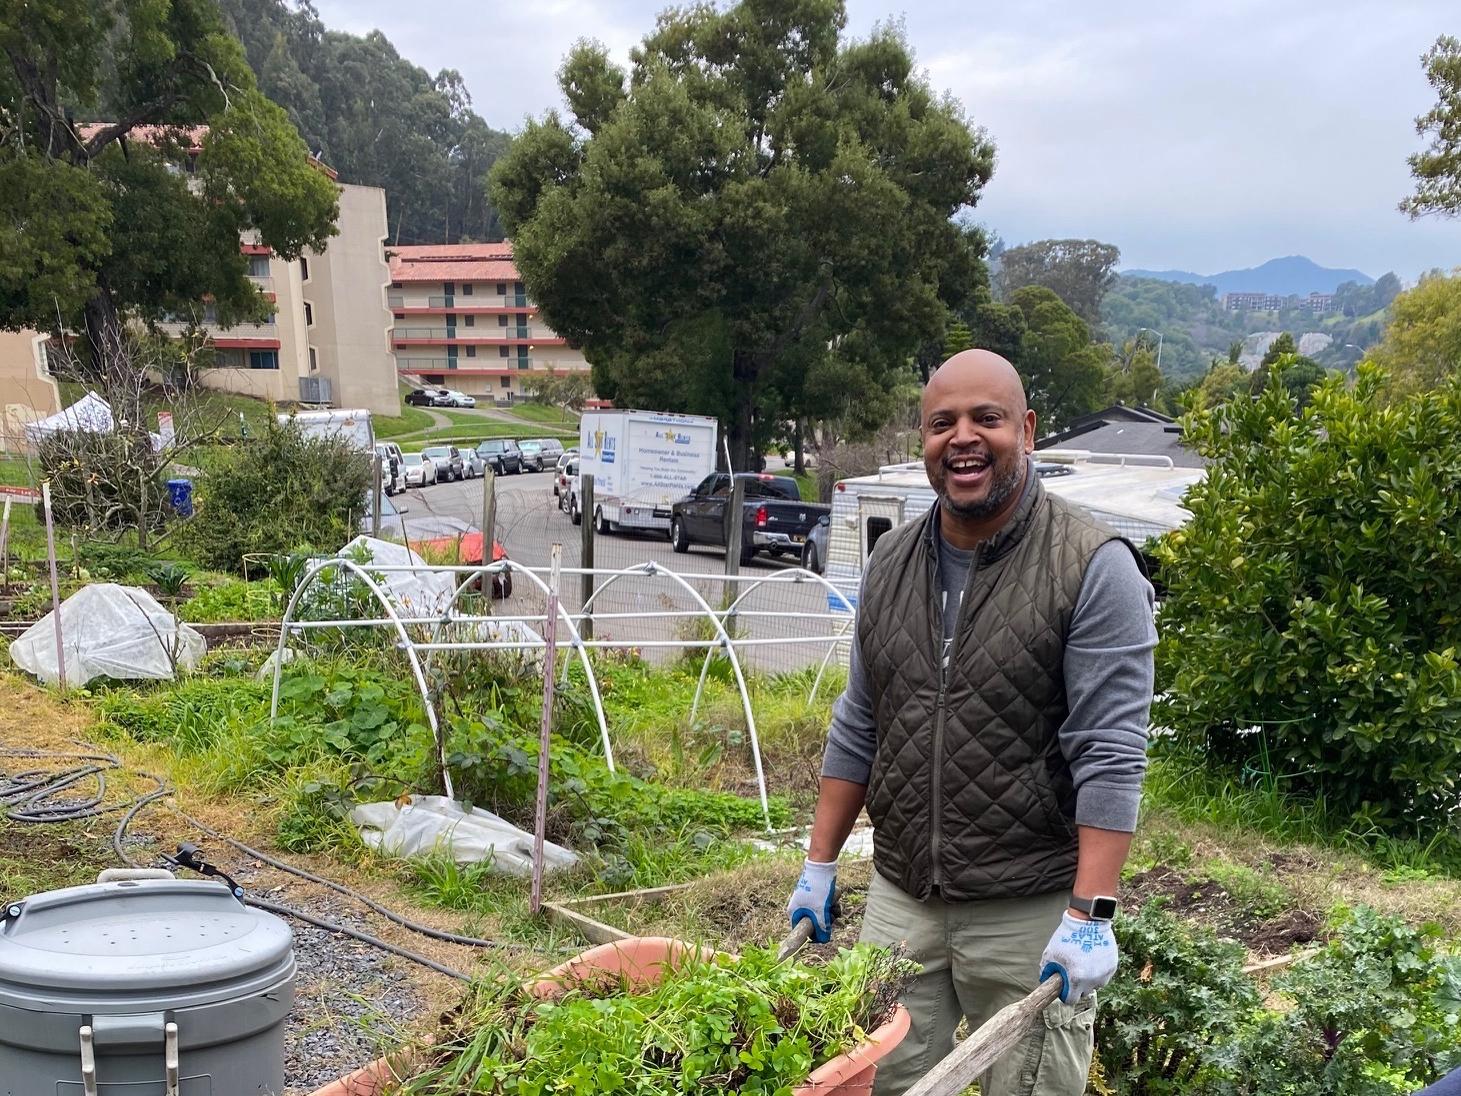 Golden Gate Village - Marin County, California